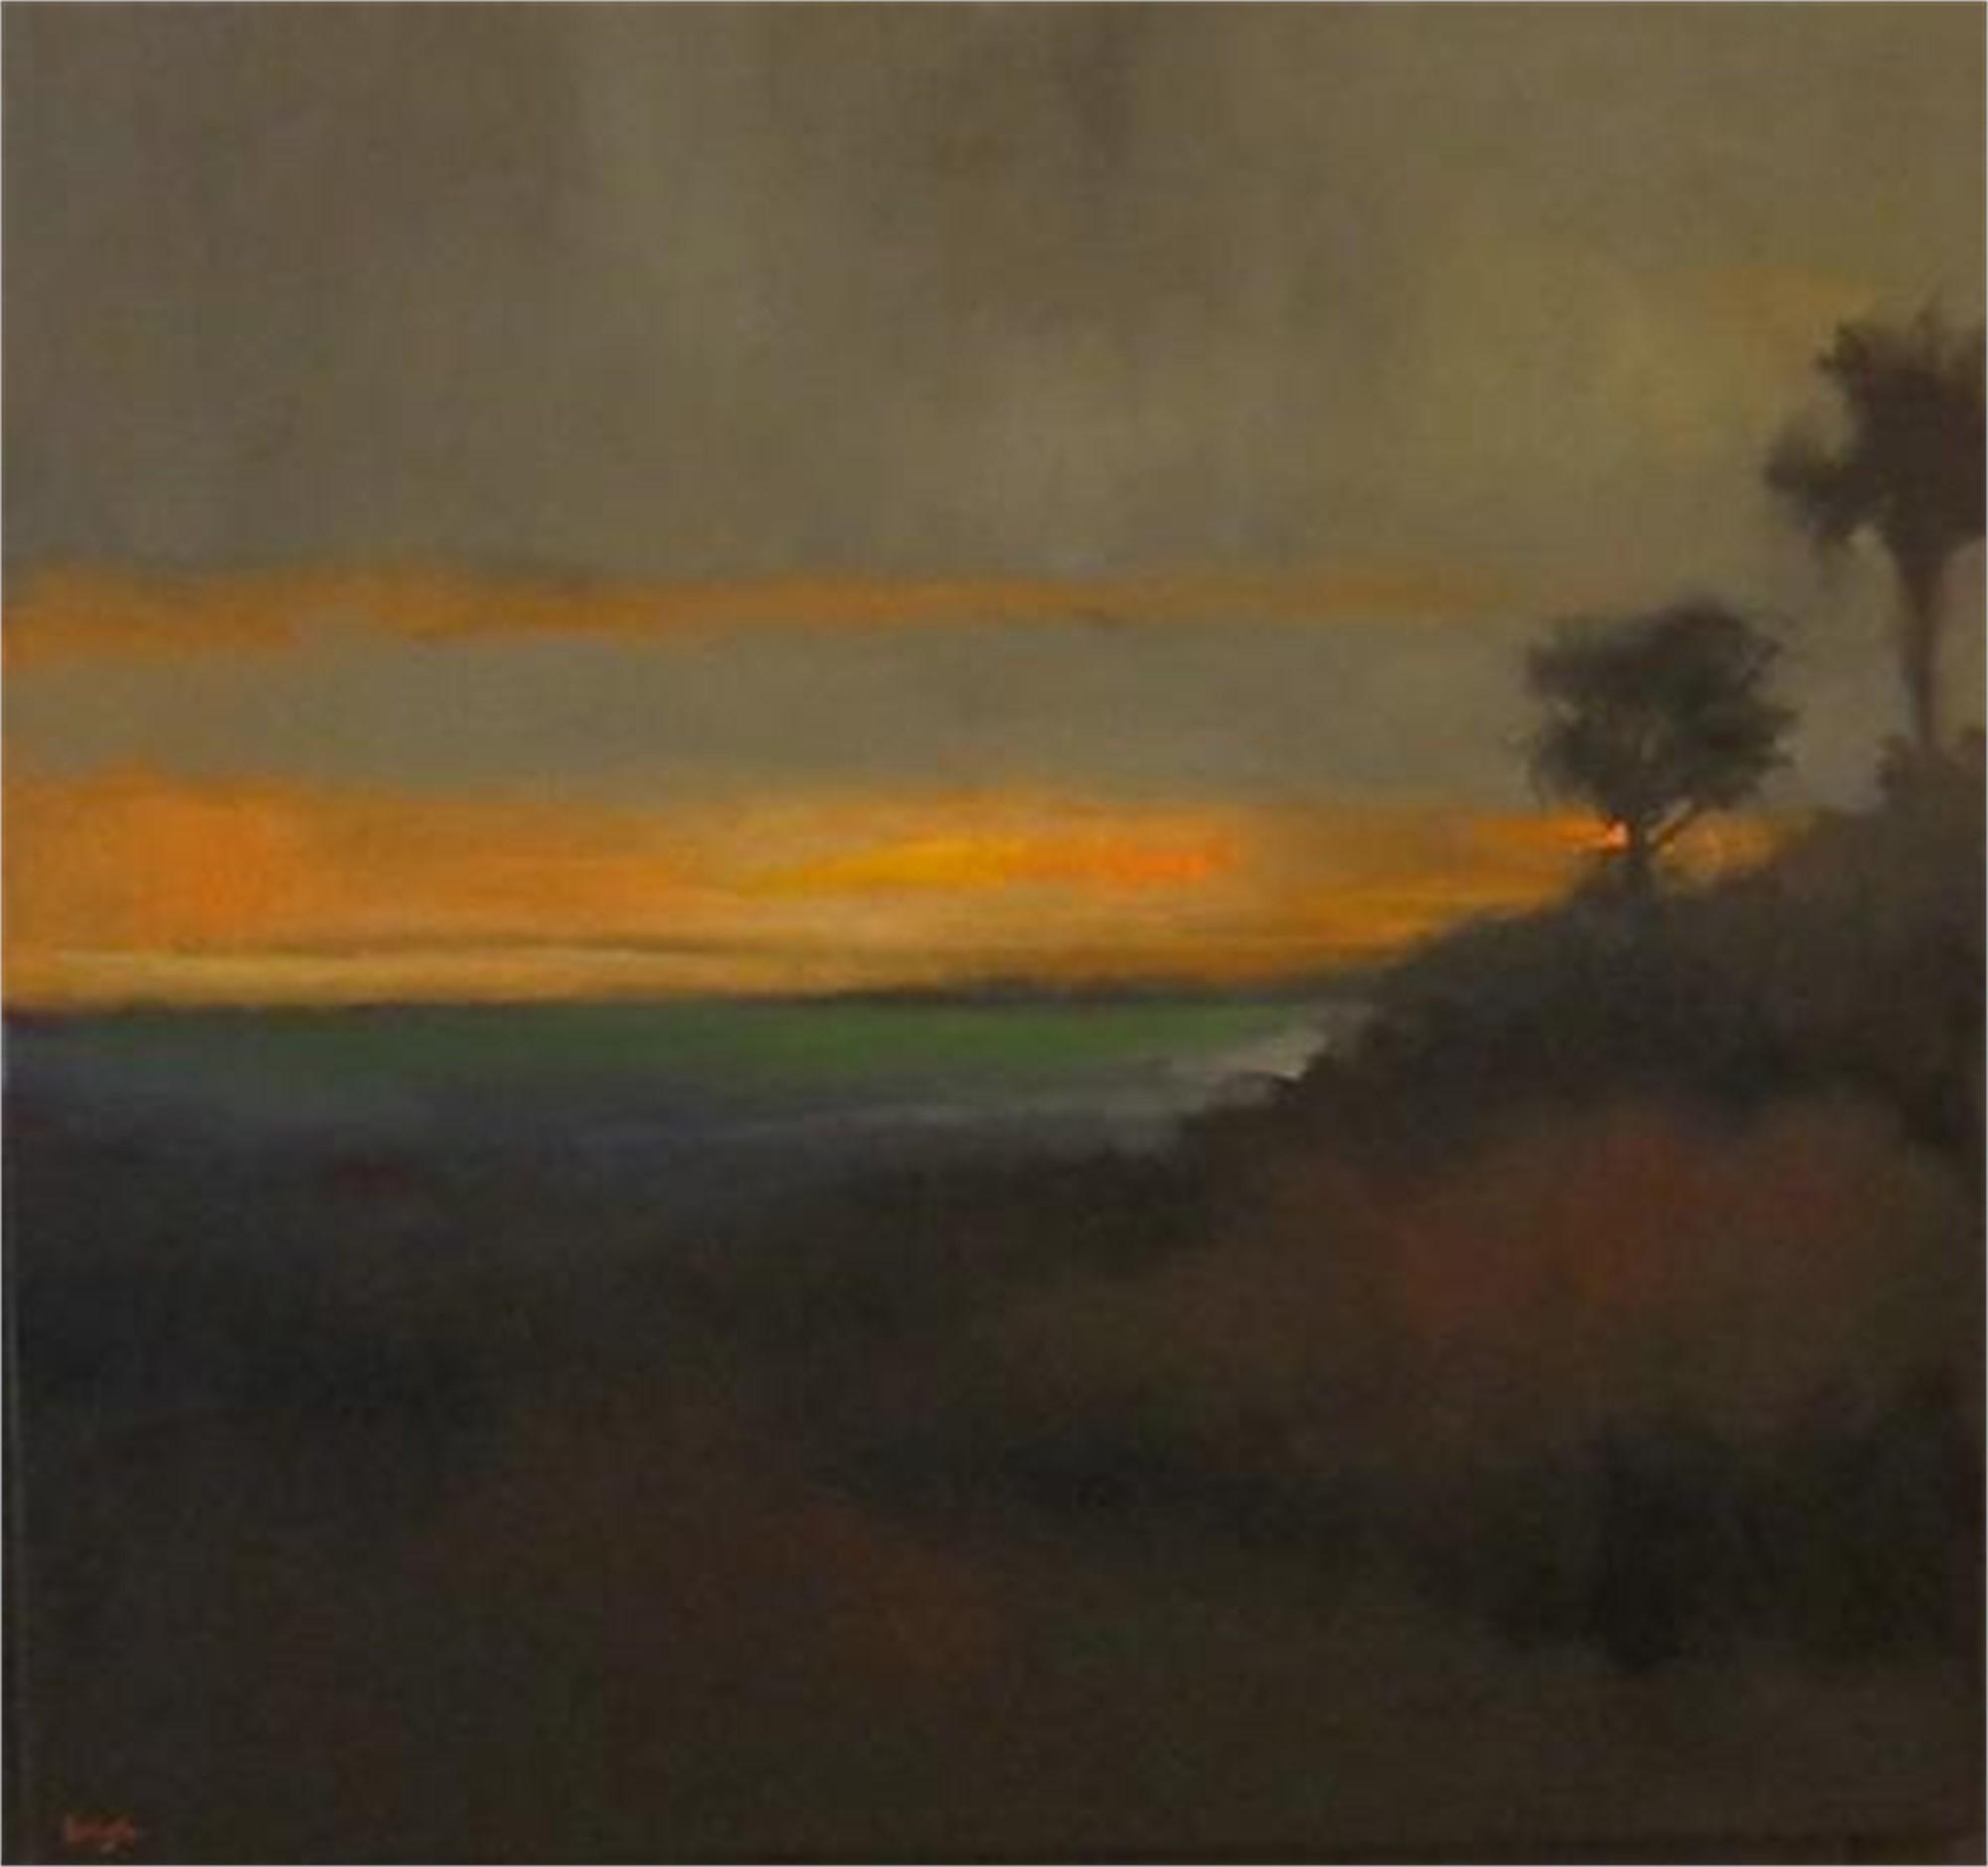 Sunrise Over the Harbor by Jim Darlington